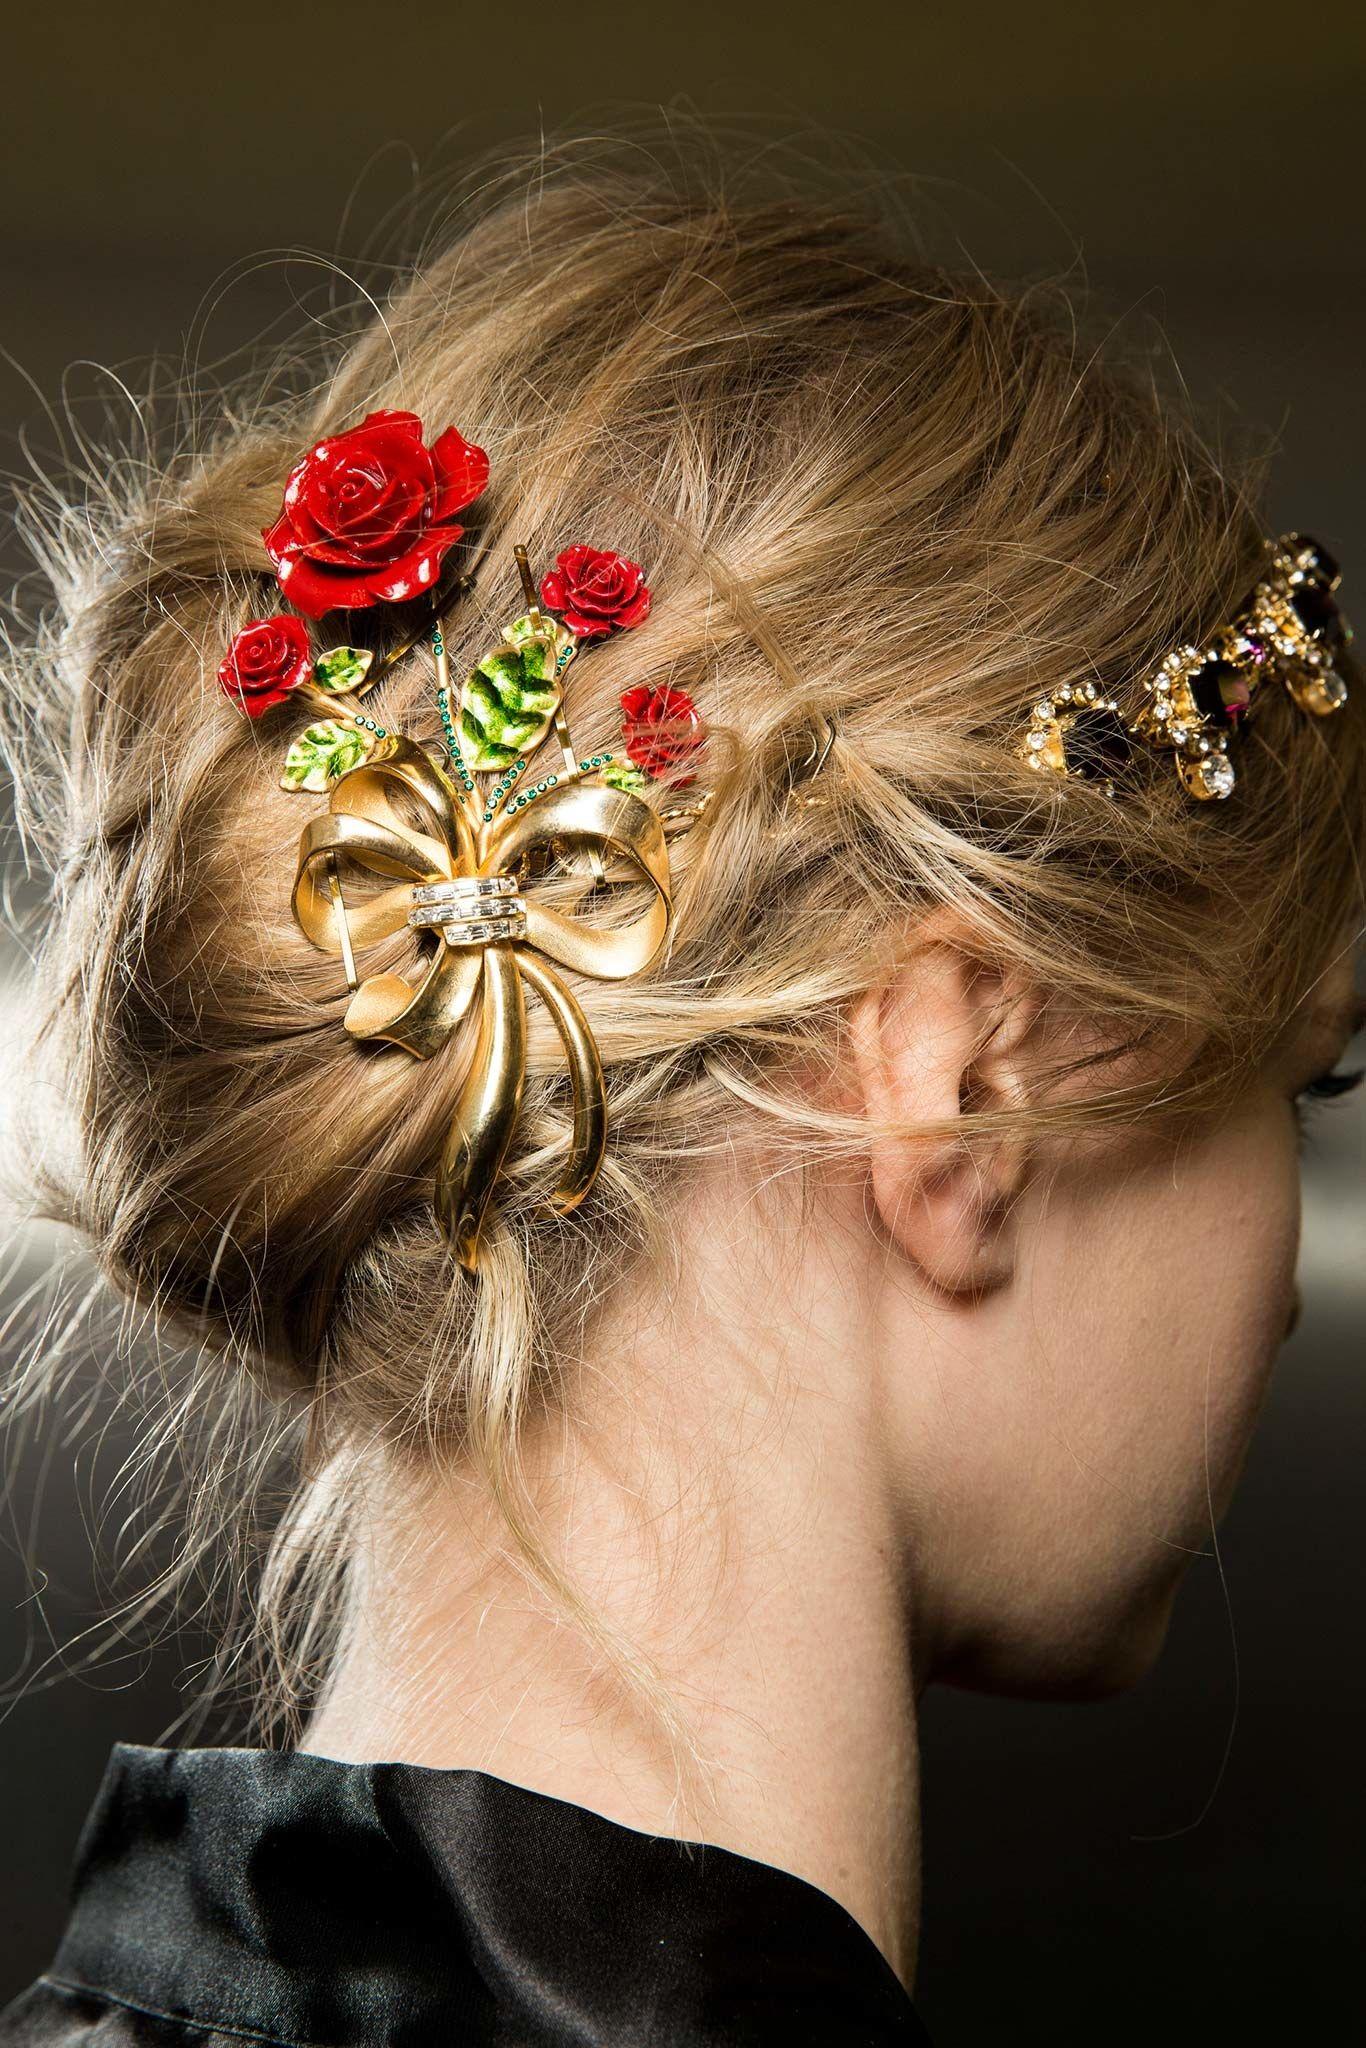 Bridal Pet Dog Cat Headdress Wedding Veil Headwear Hair Clip Grooming Tull New